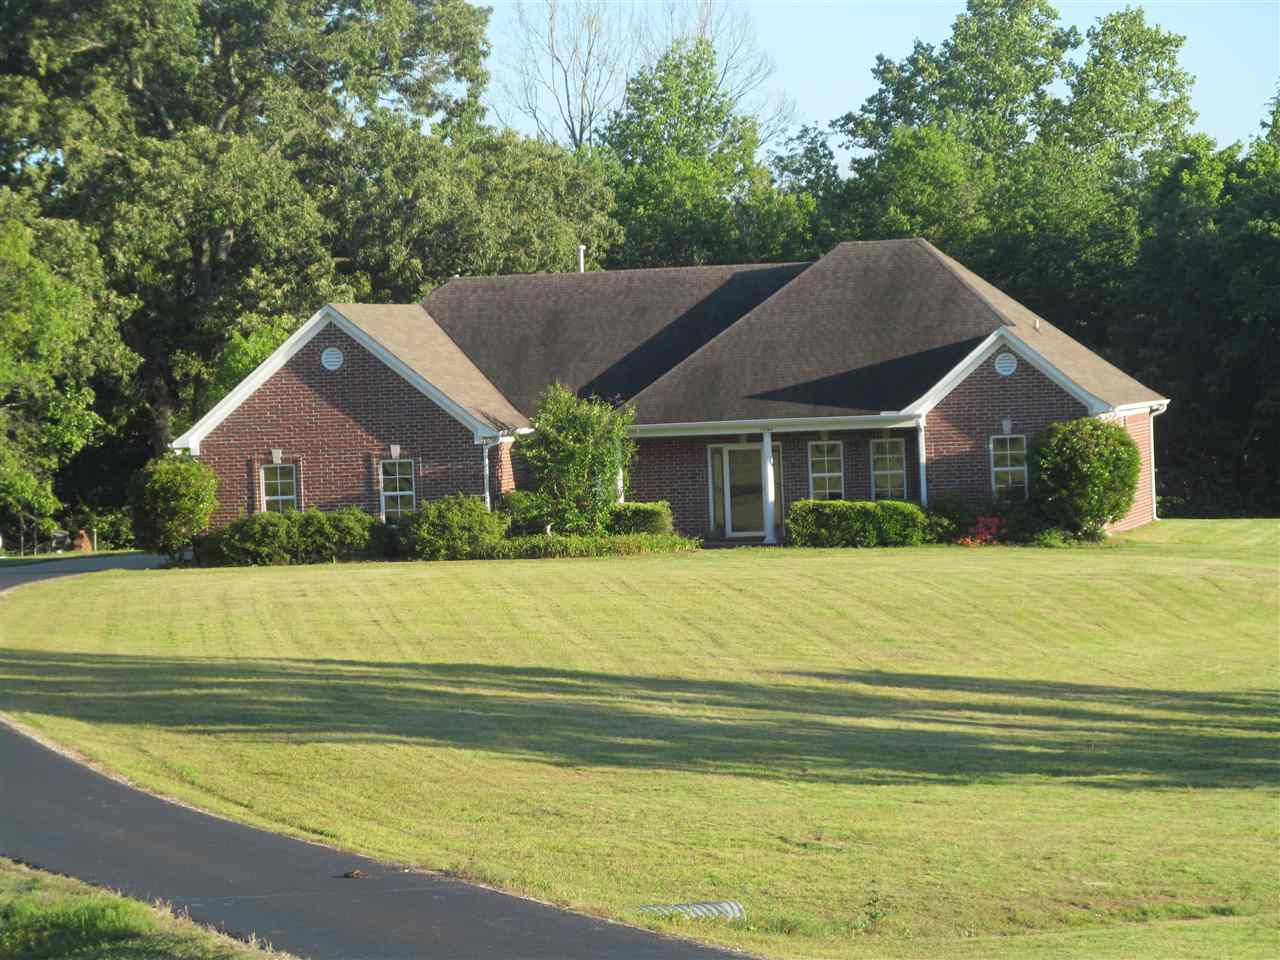 1230 Asbury Somerville, TN 38068 - MLS #: 10002645